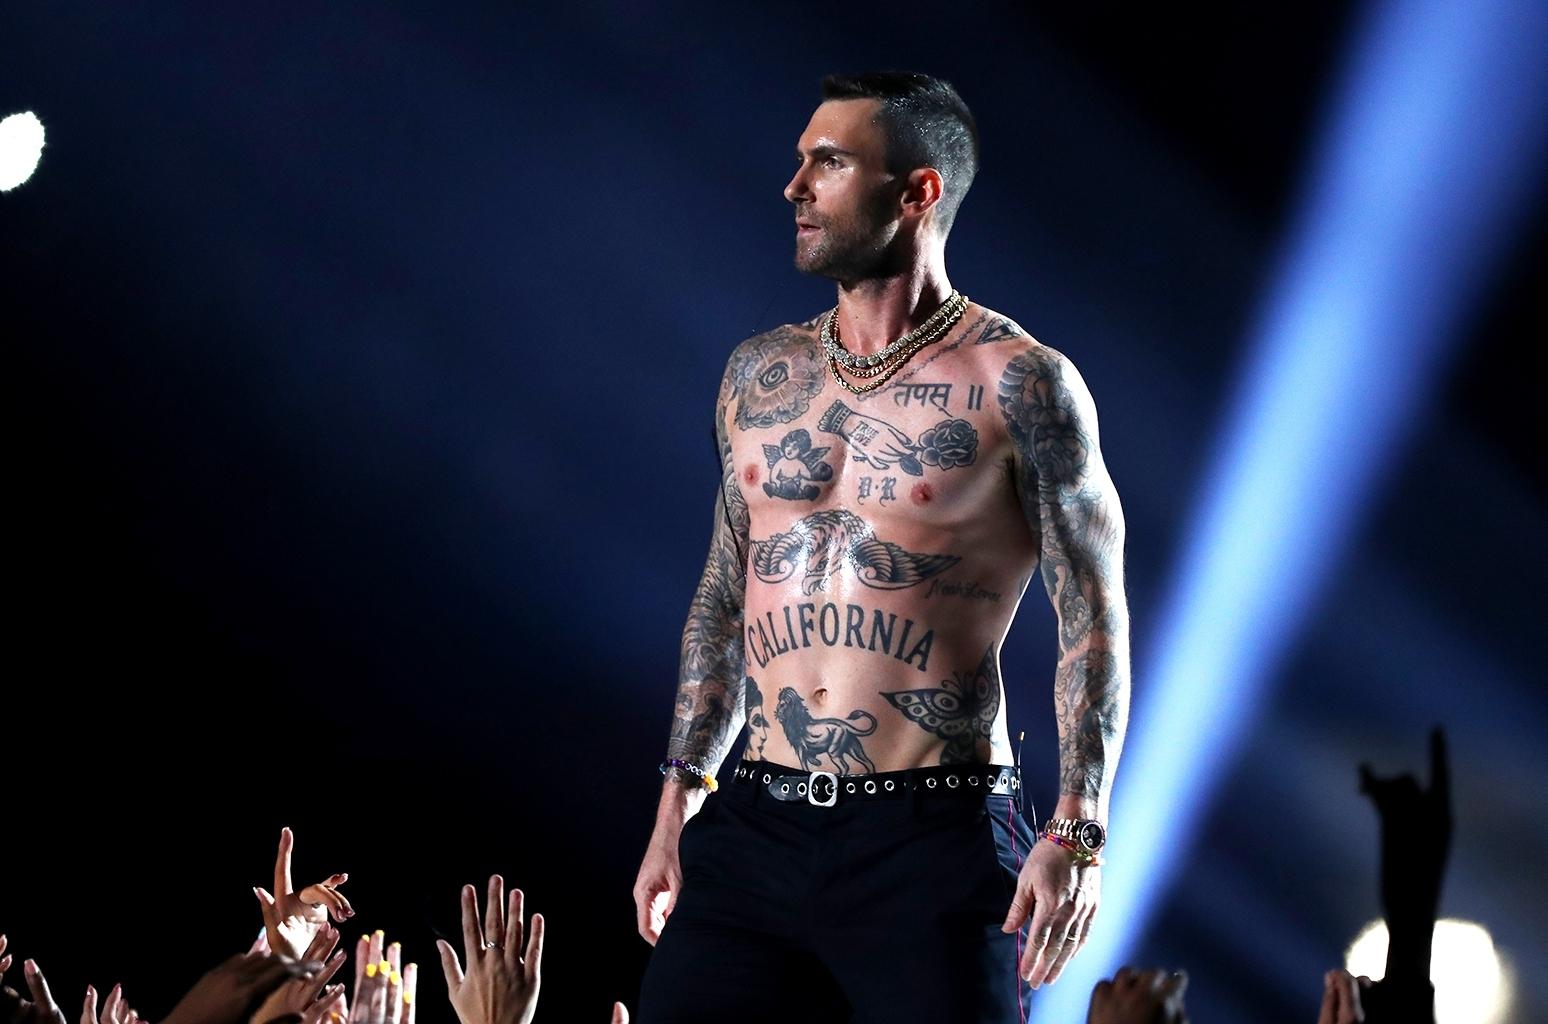 2019 Super Bowl: Adam Levine Removes Shirt, Twitter Explodes for Maroon Five Super Bowl 2019